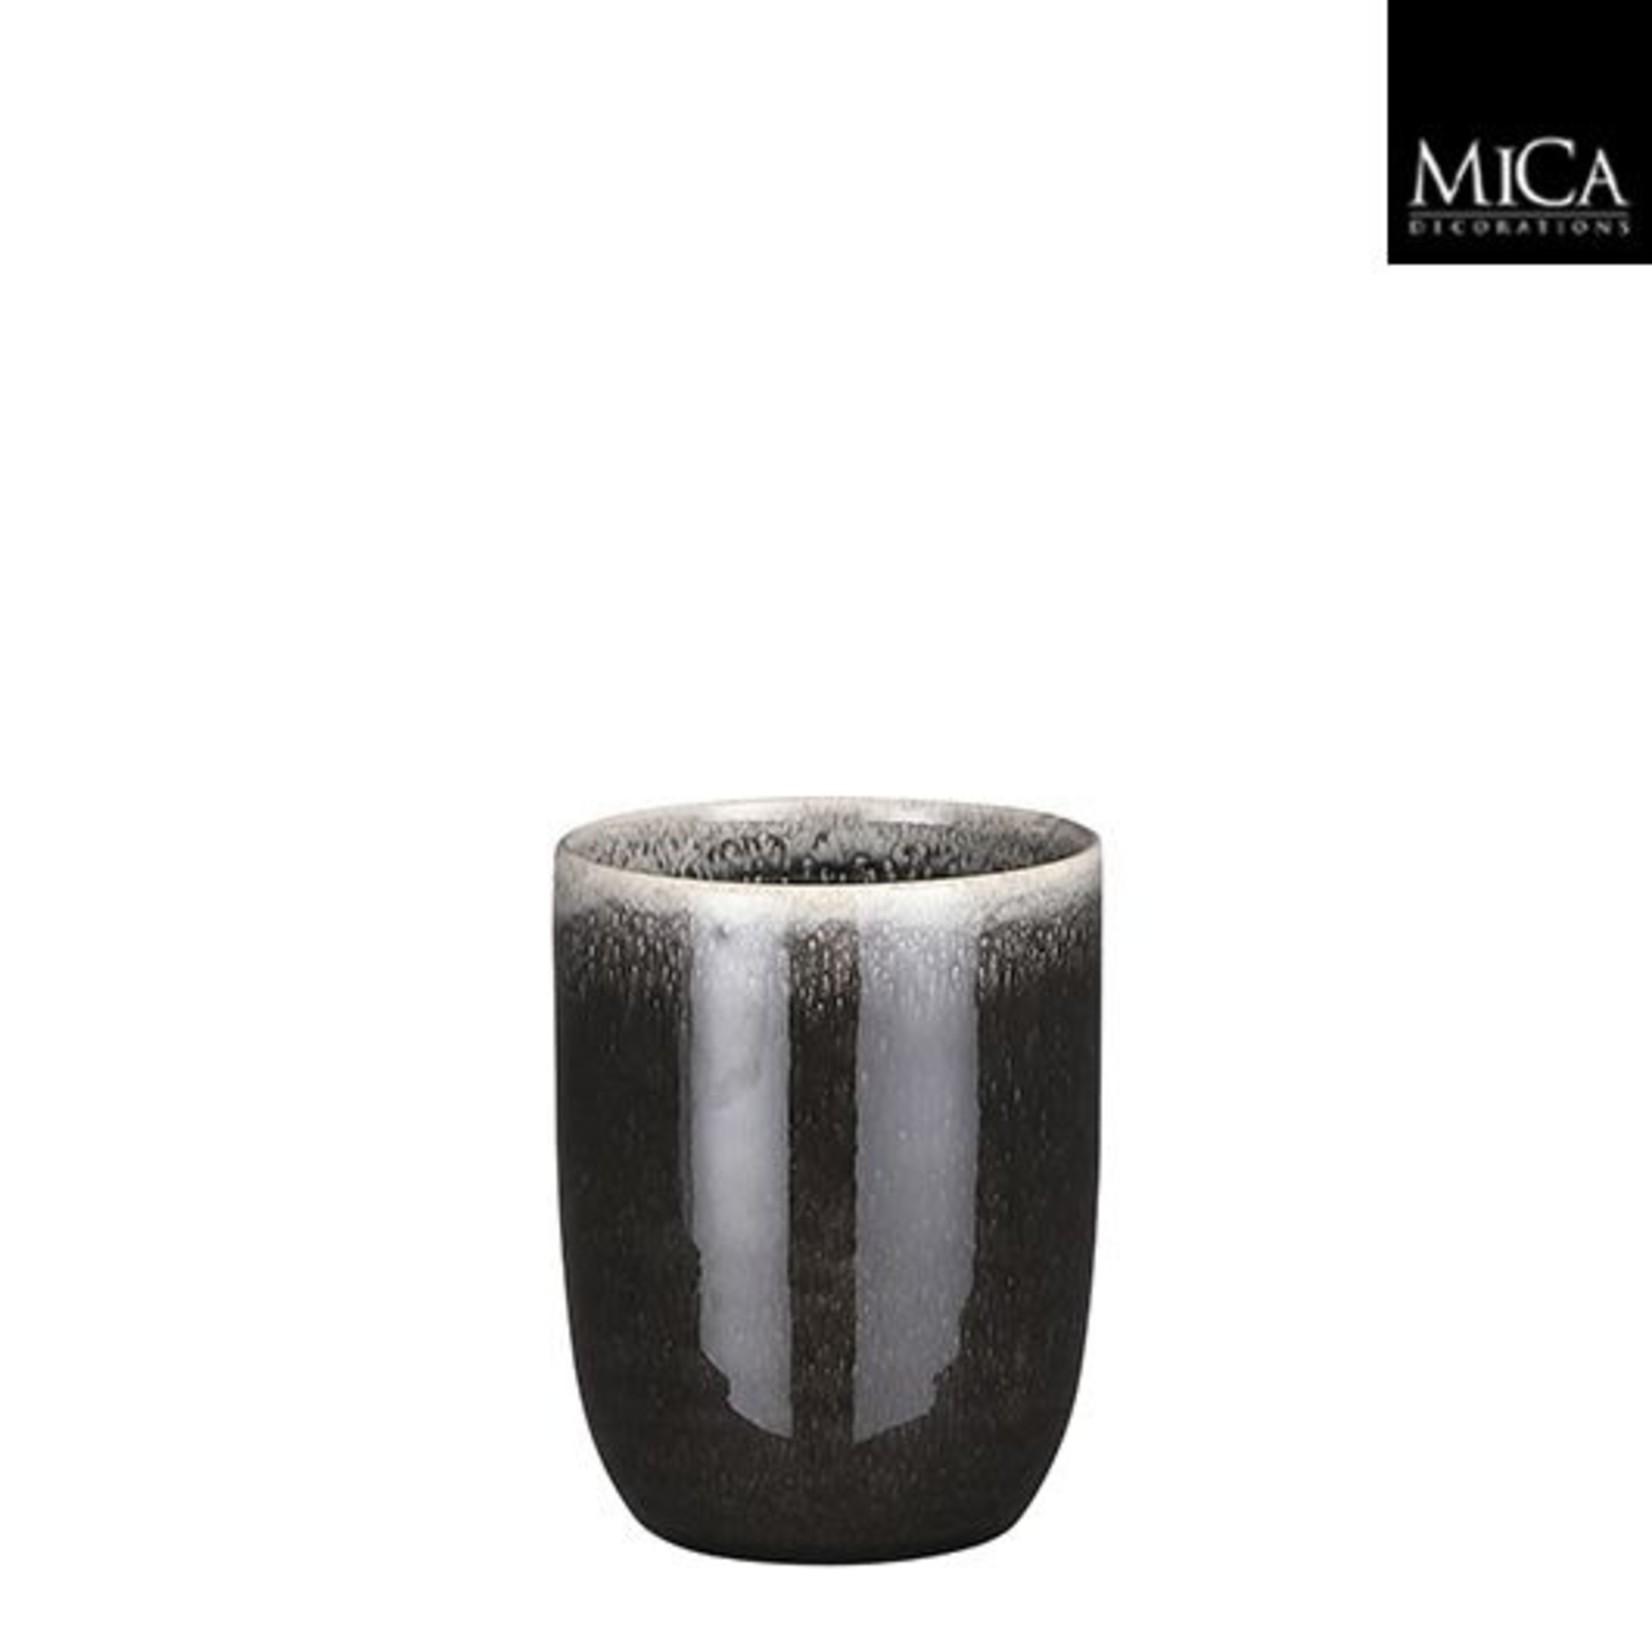 MiCa Tabo mug black